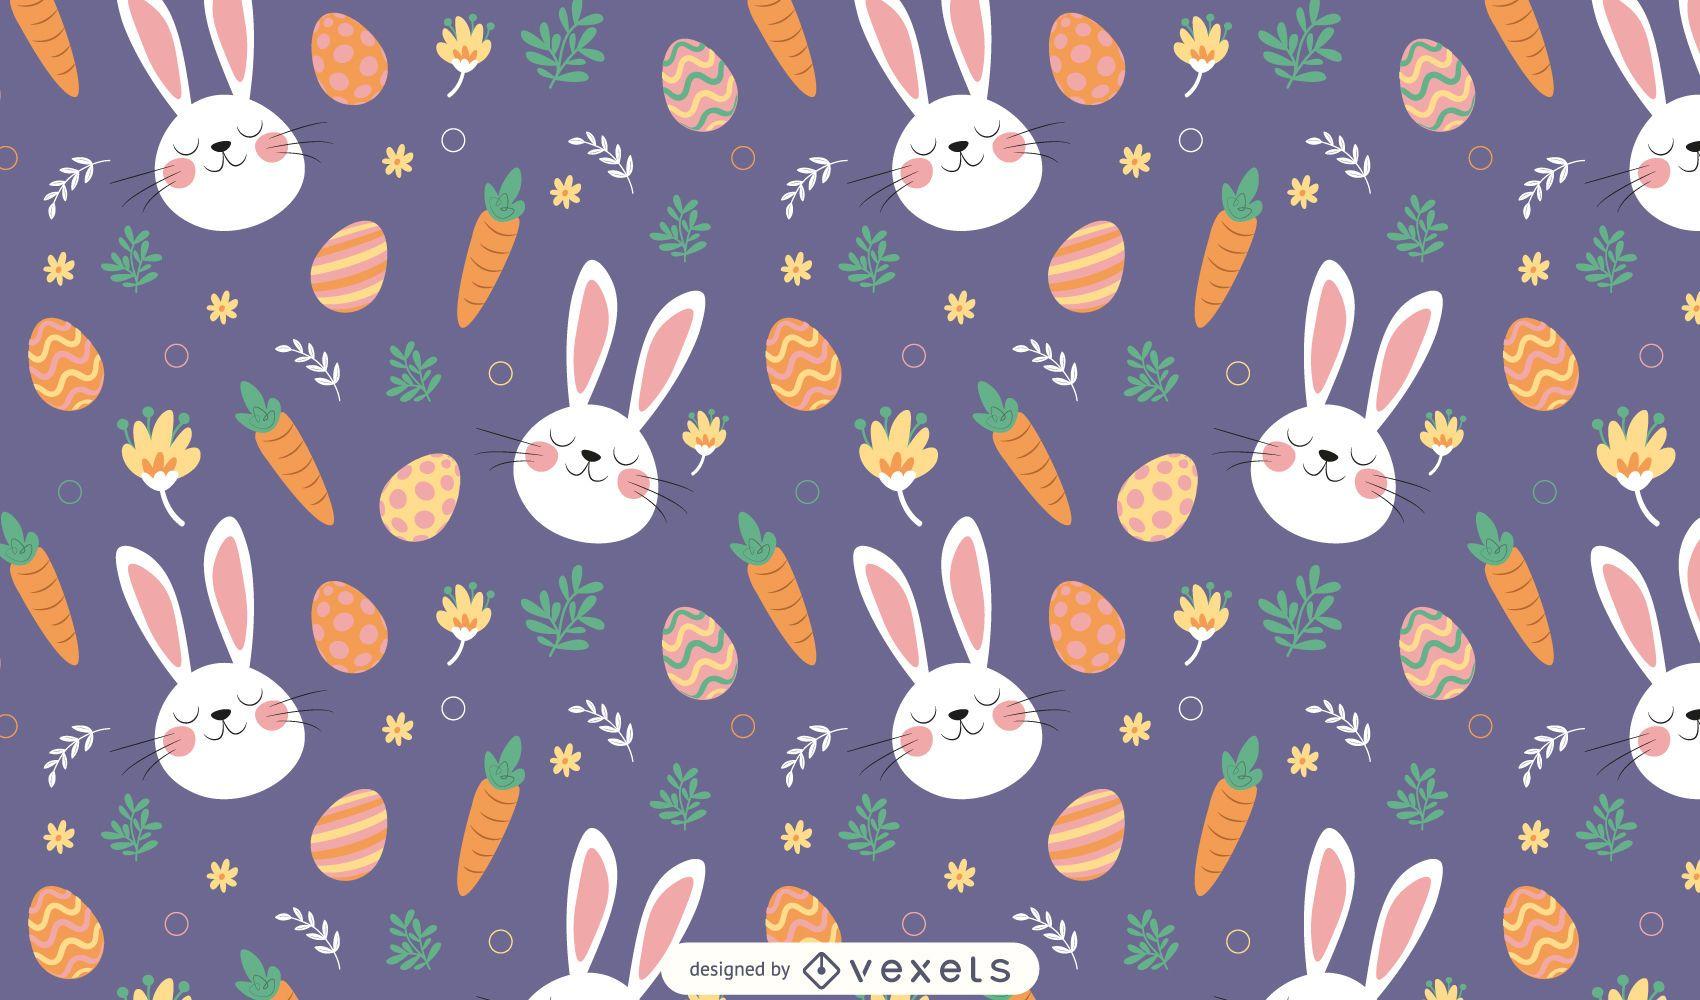 Diseño de patrón de conejitos de pascua